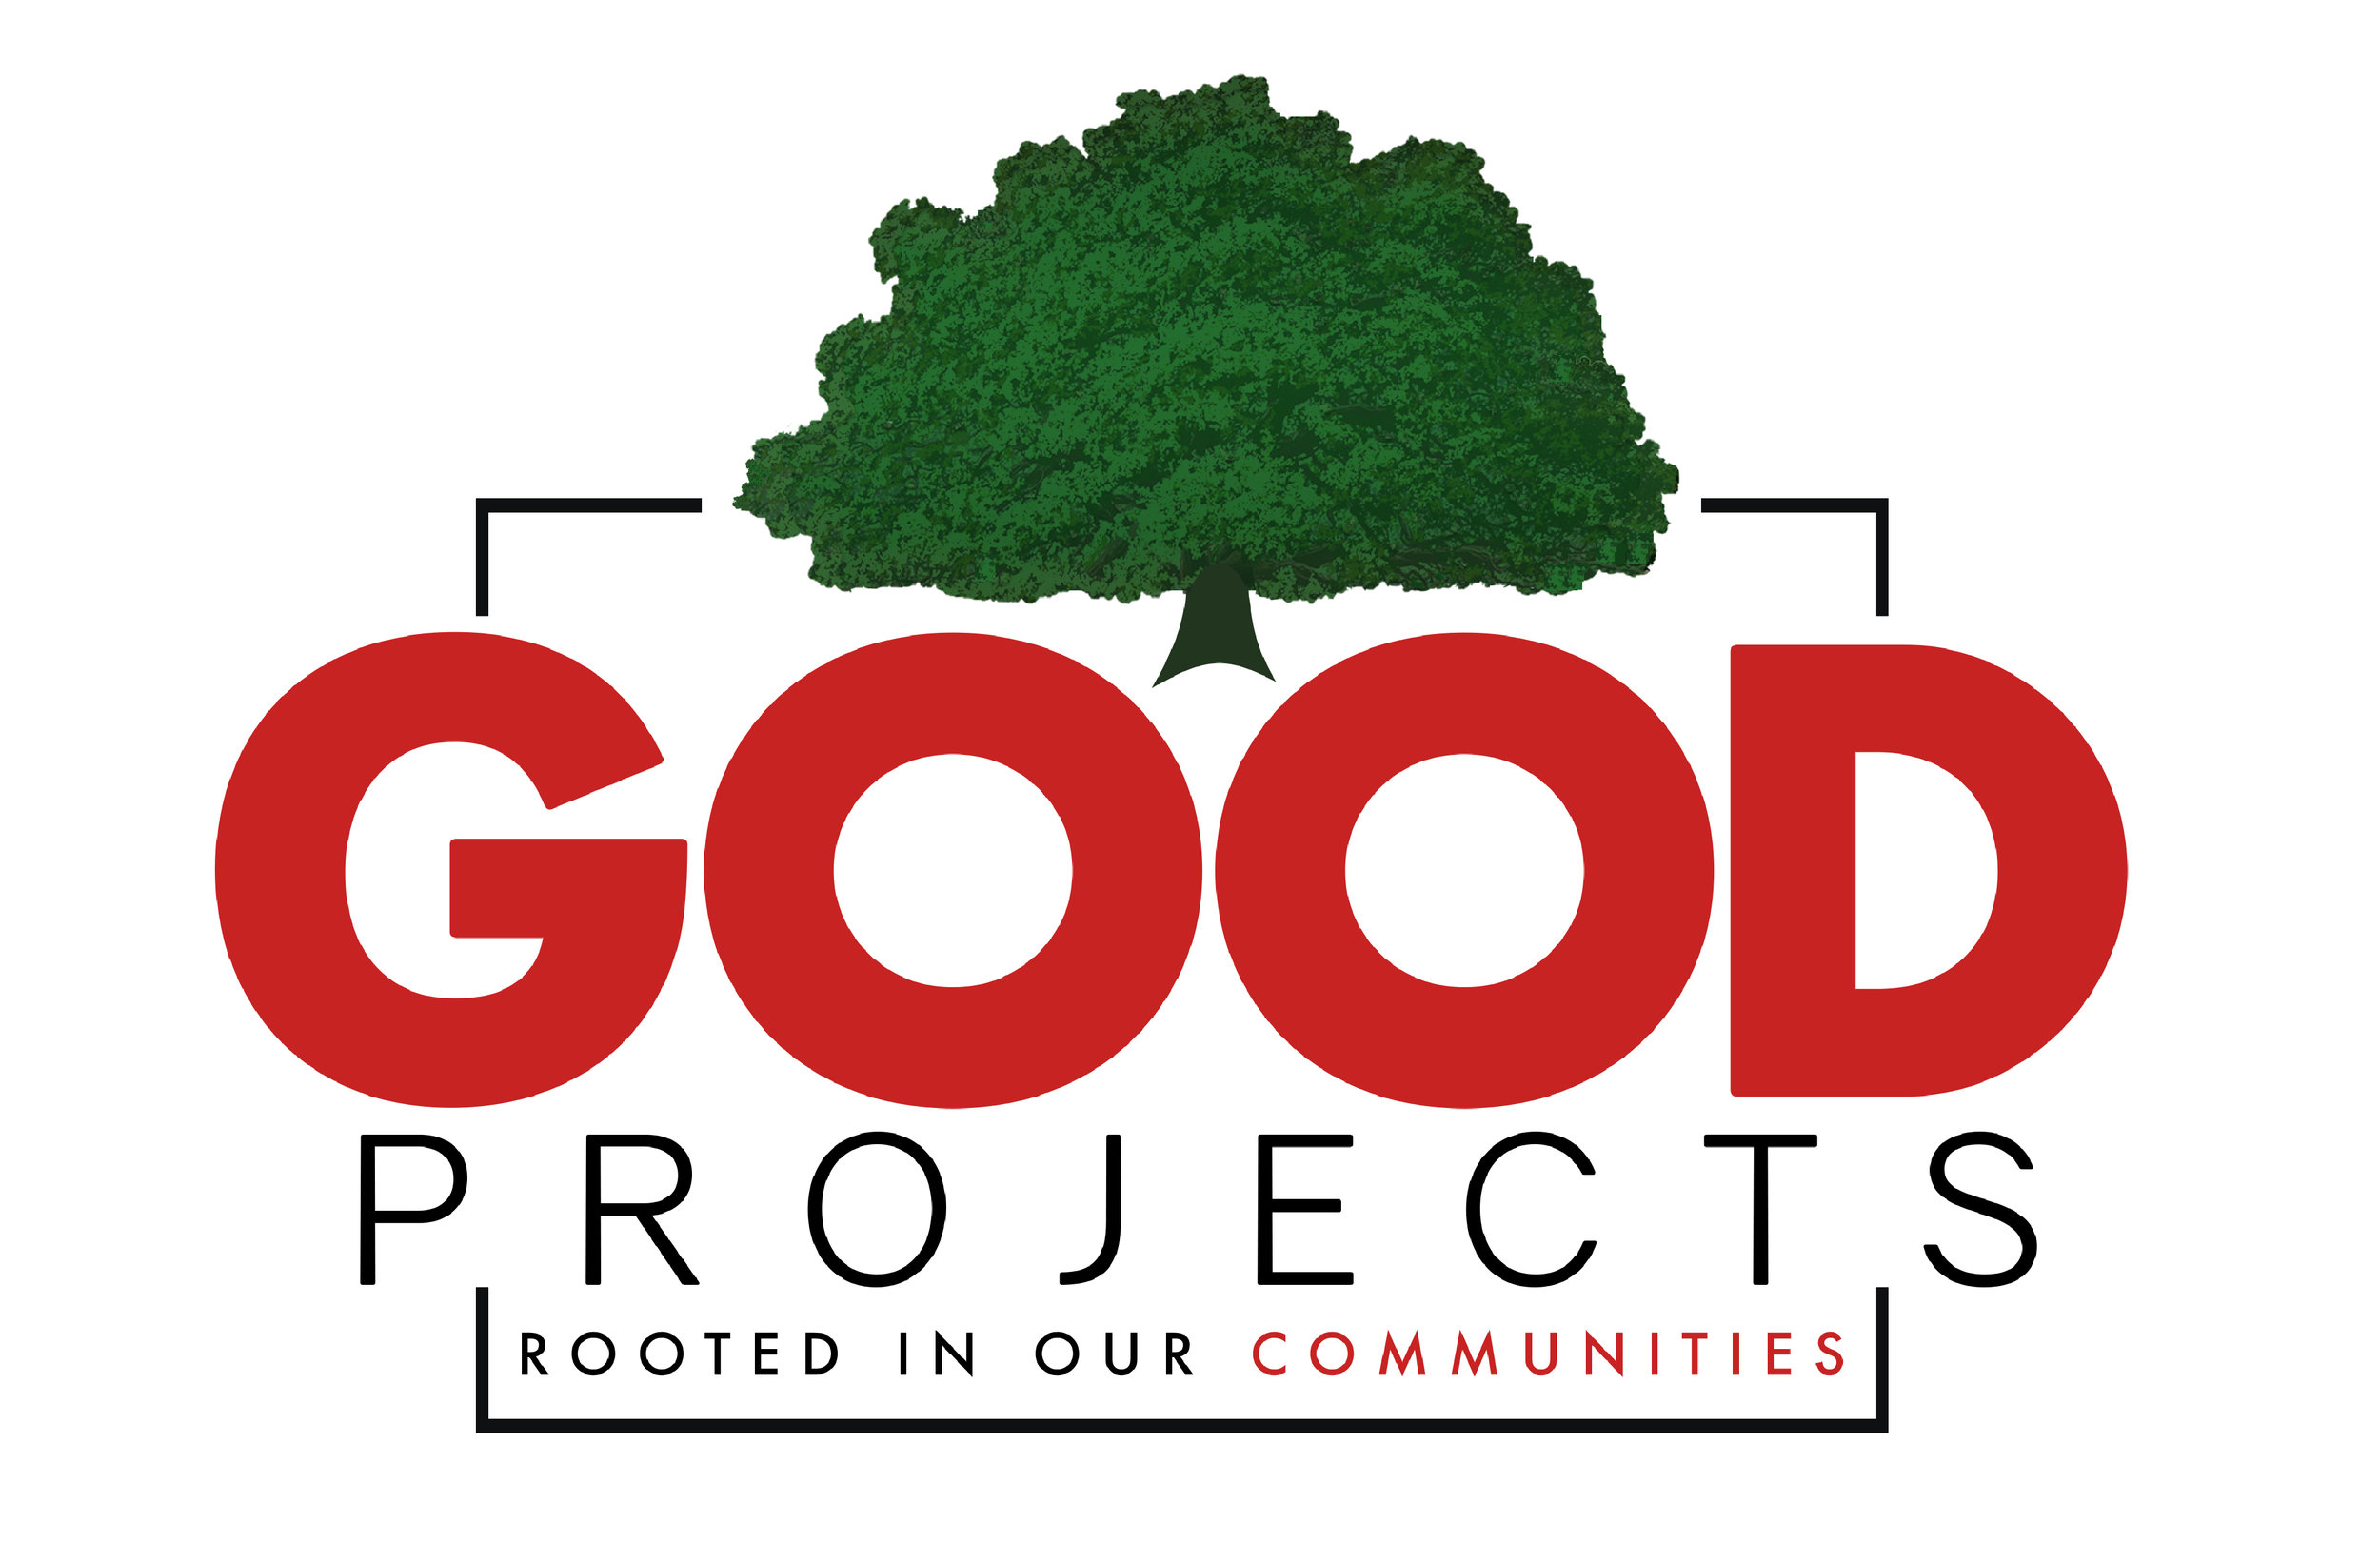 Copy of GoodProject.jpg